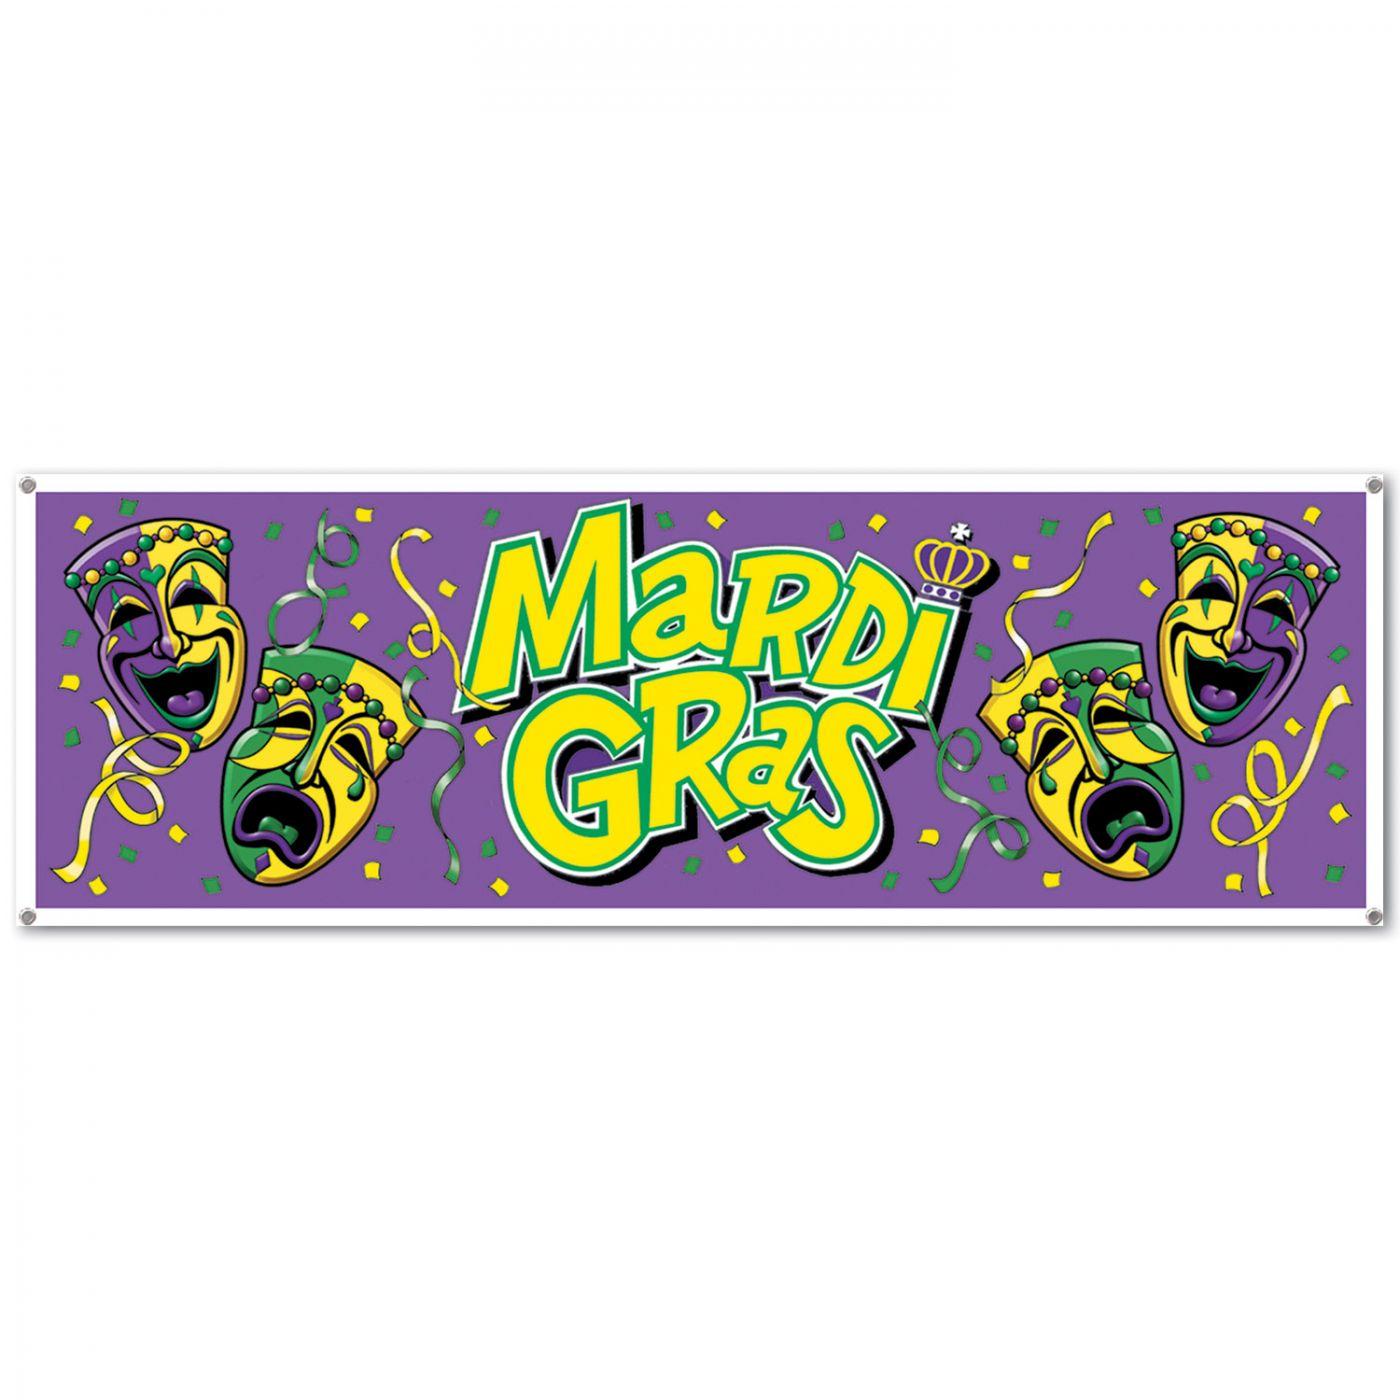 Mardi Gras Sign Banner image